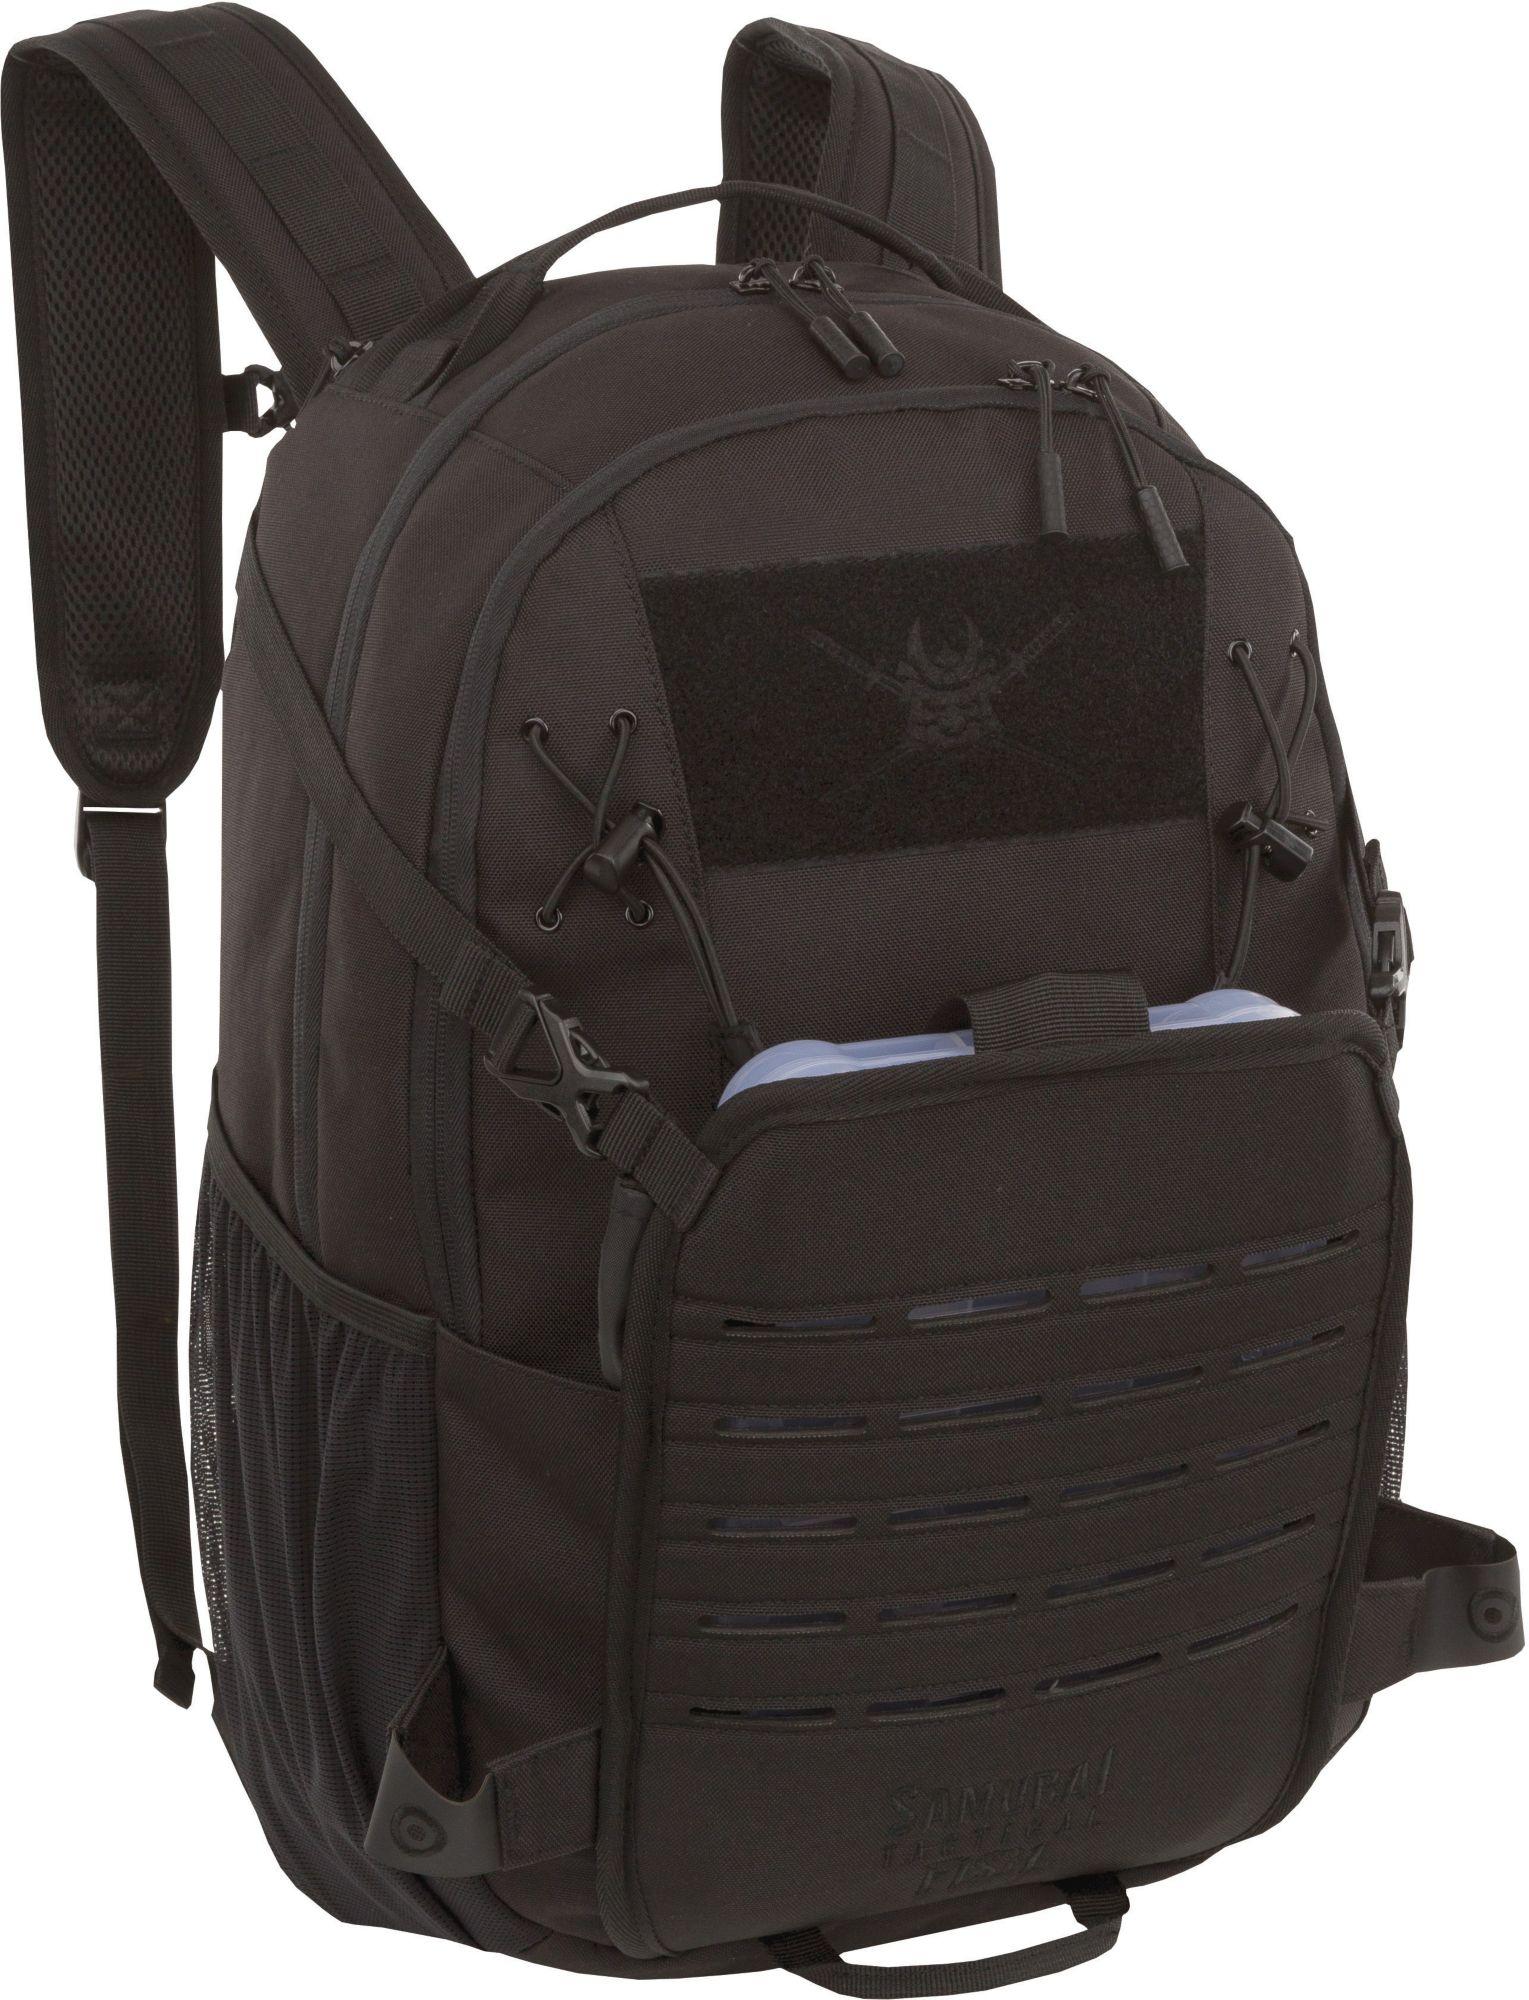 Samurai Tactical Nekogigi Tackle Backpack, Size: One size